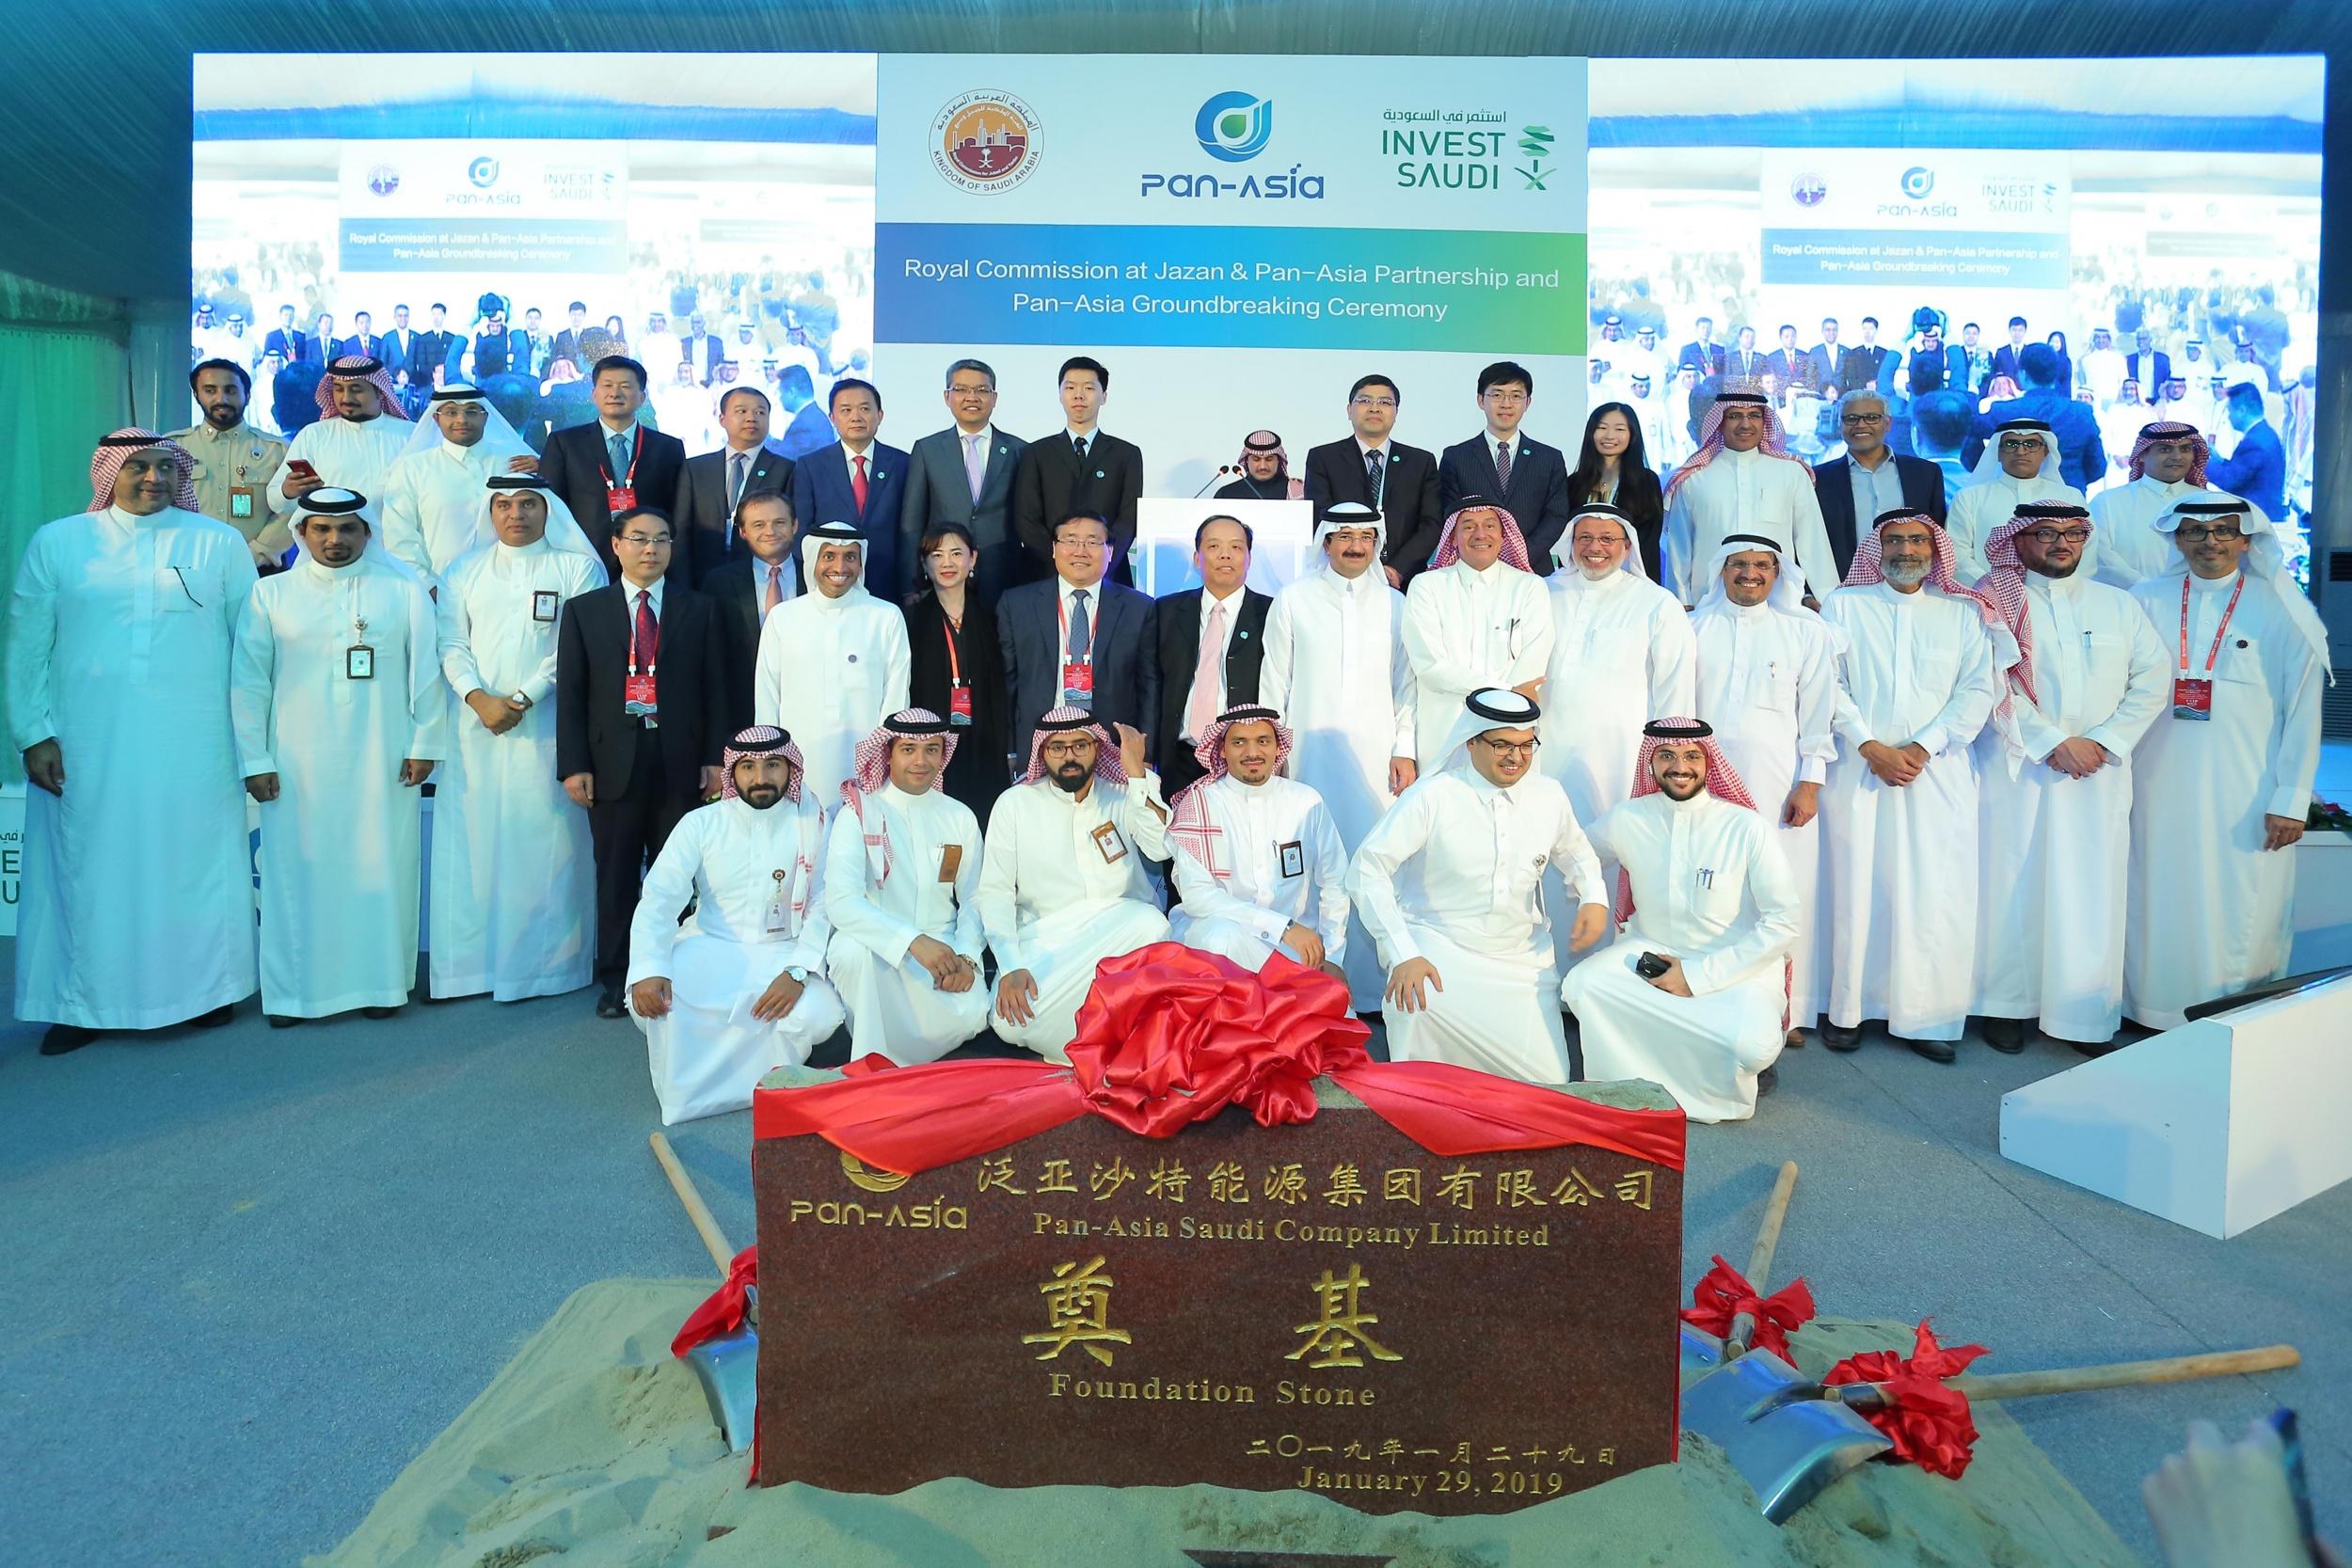 bwin必赢网址沙特石油化工化纤一体化项目奠基仪式成功举办